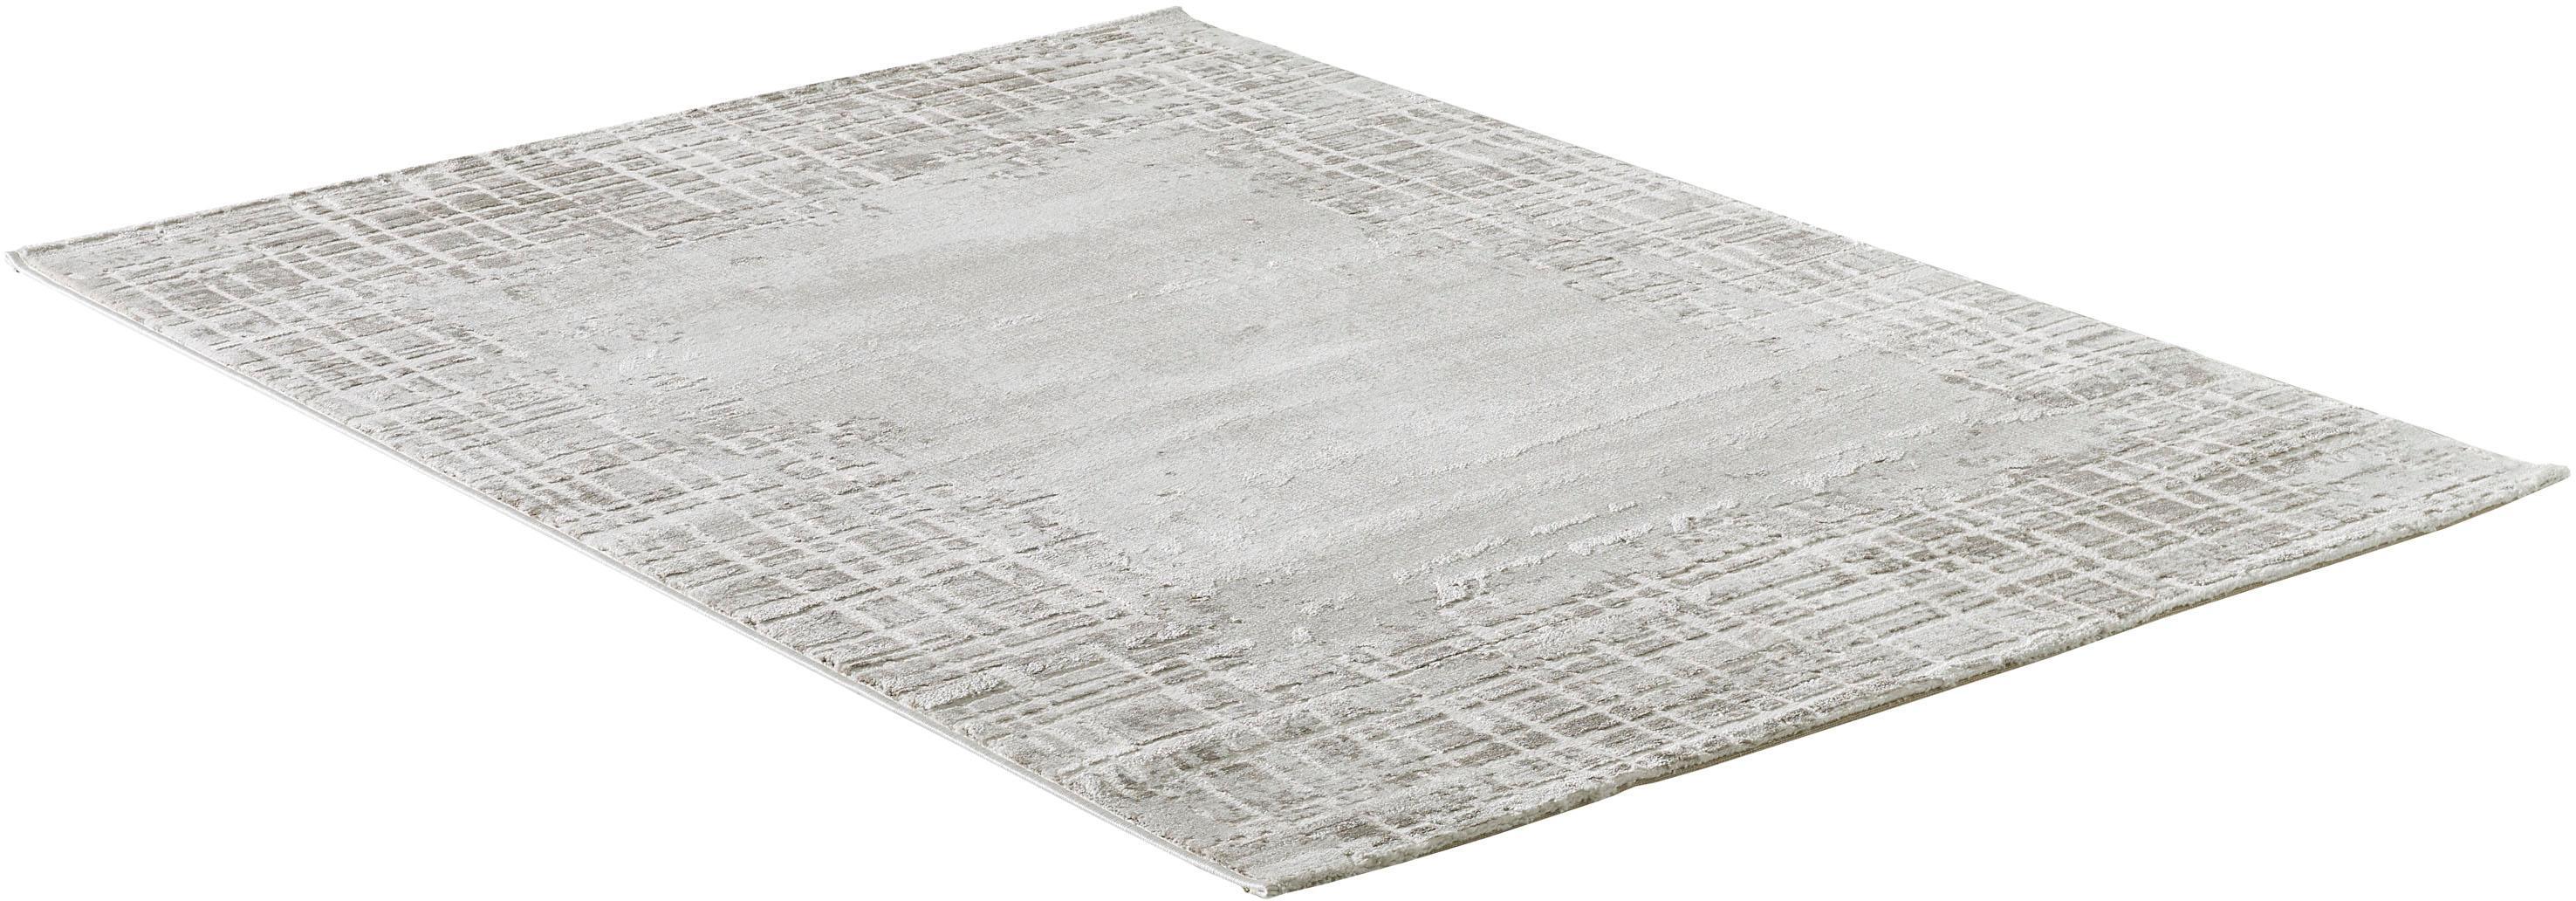 Teppich Harmony 3210 Sanat Teppiche rechteckig Höhe 12 mm maschinell gewebt